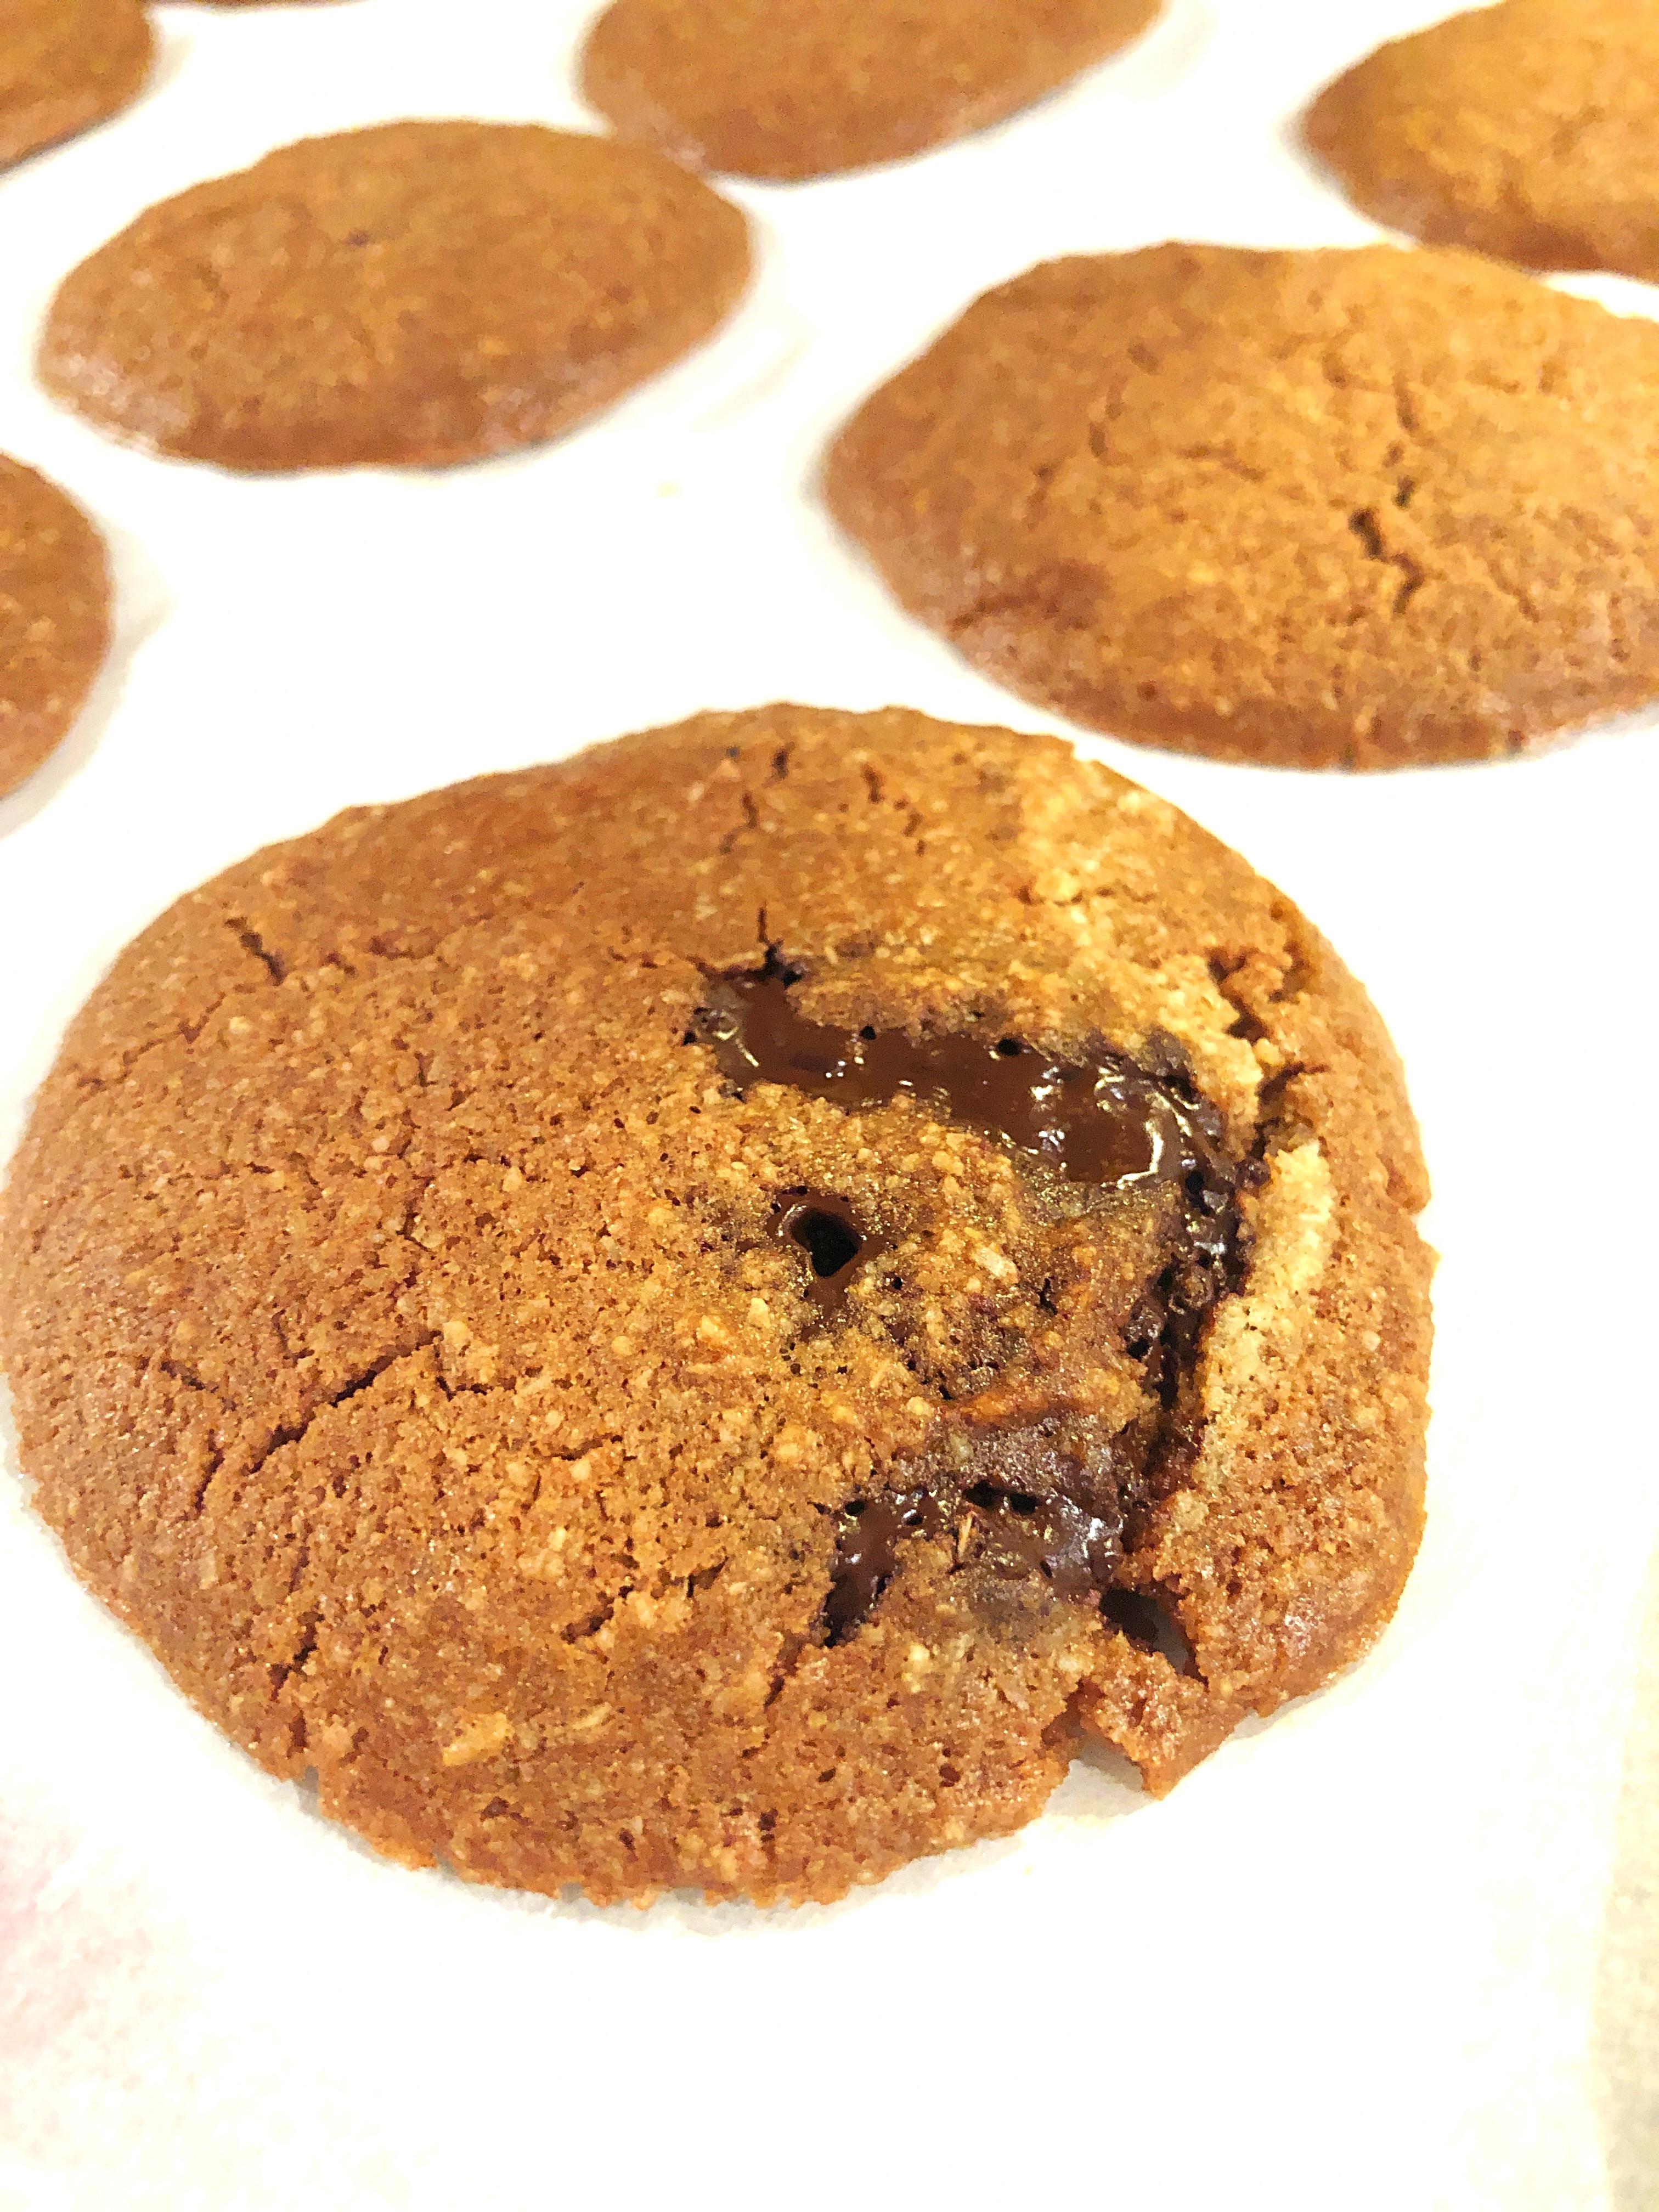 cheery and charming_keto_chocolate chip cookies_1